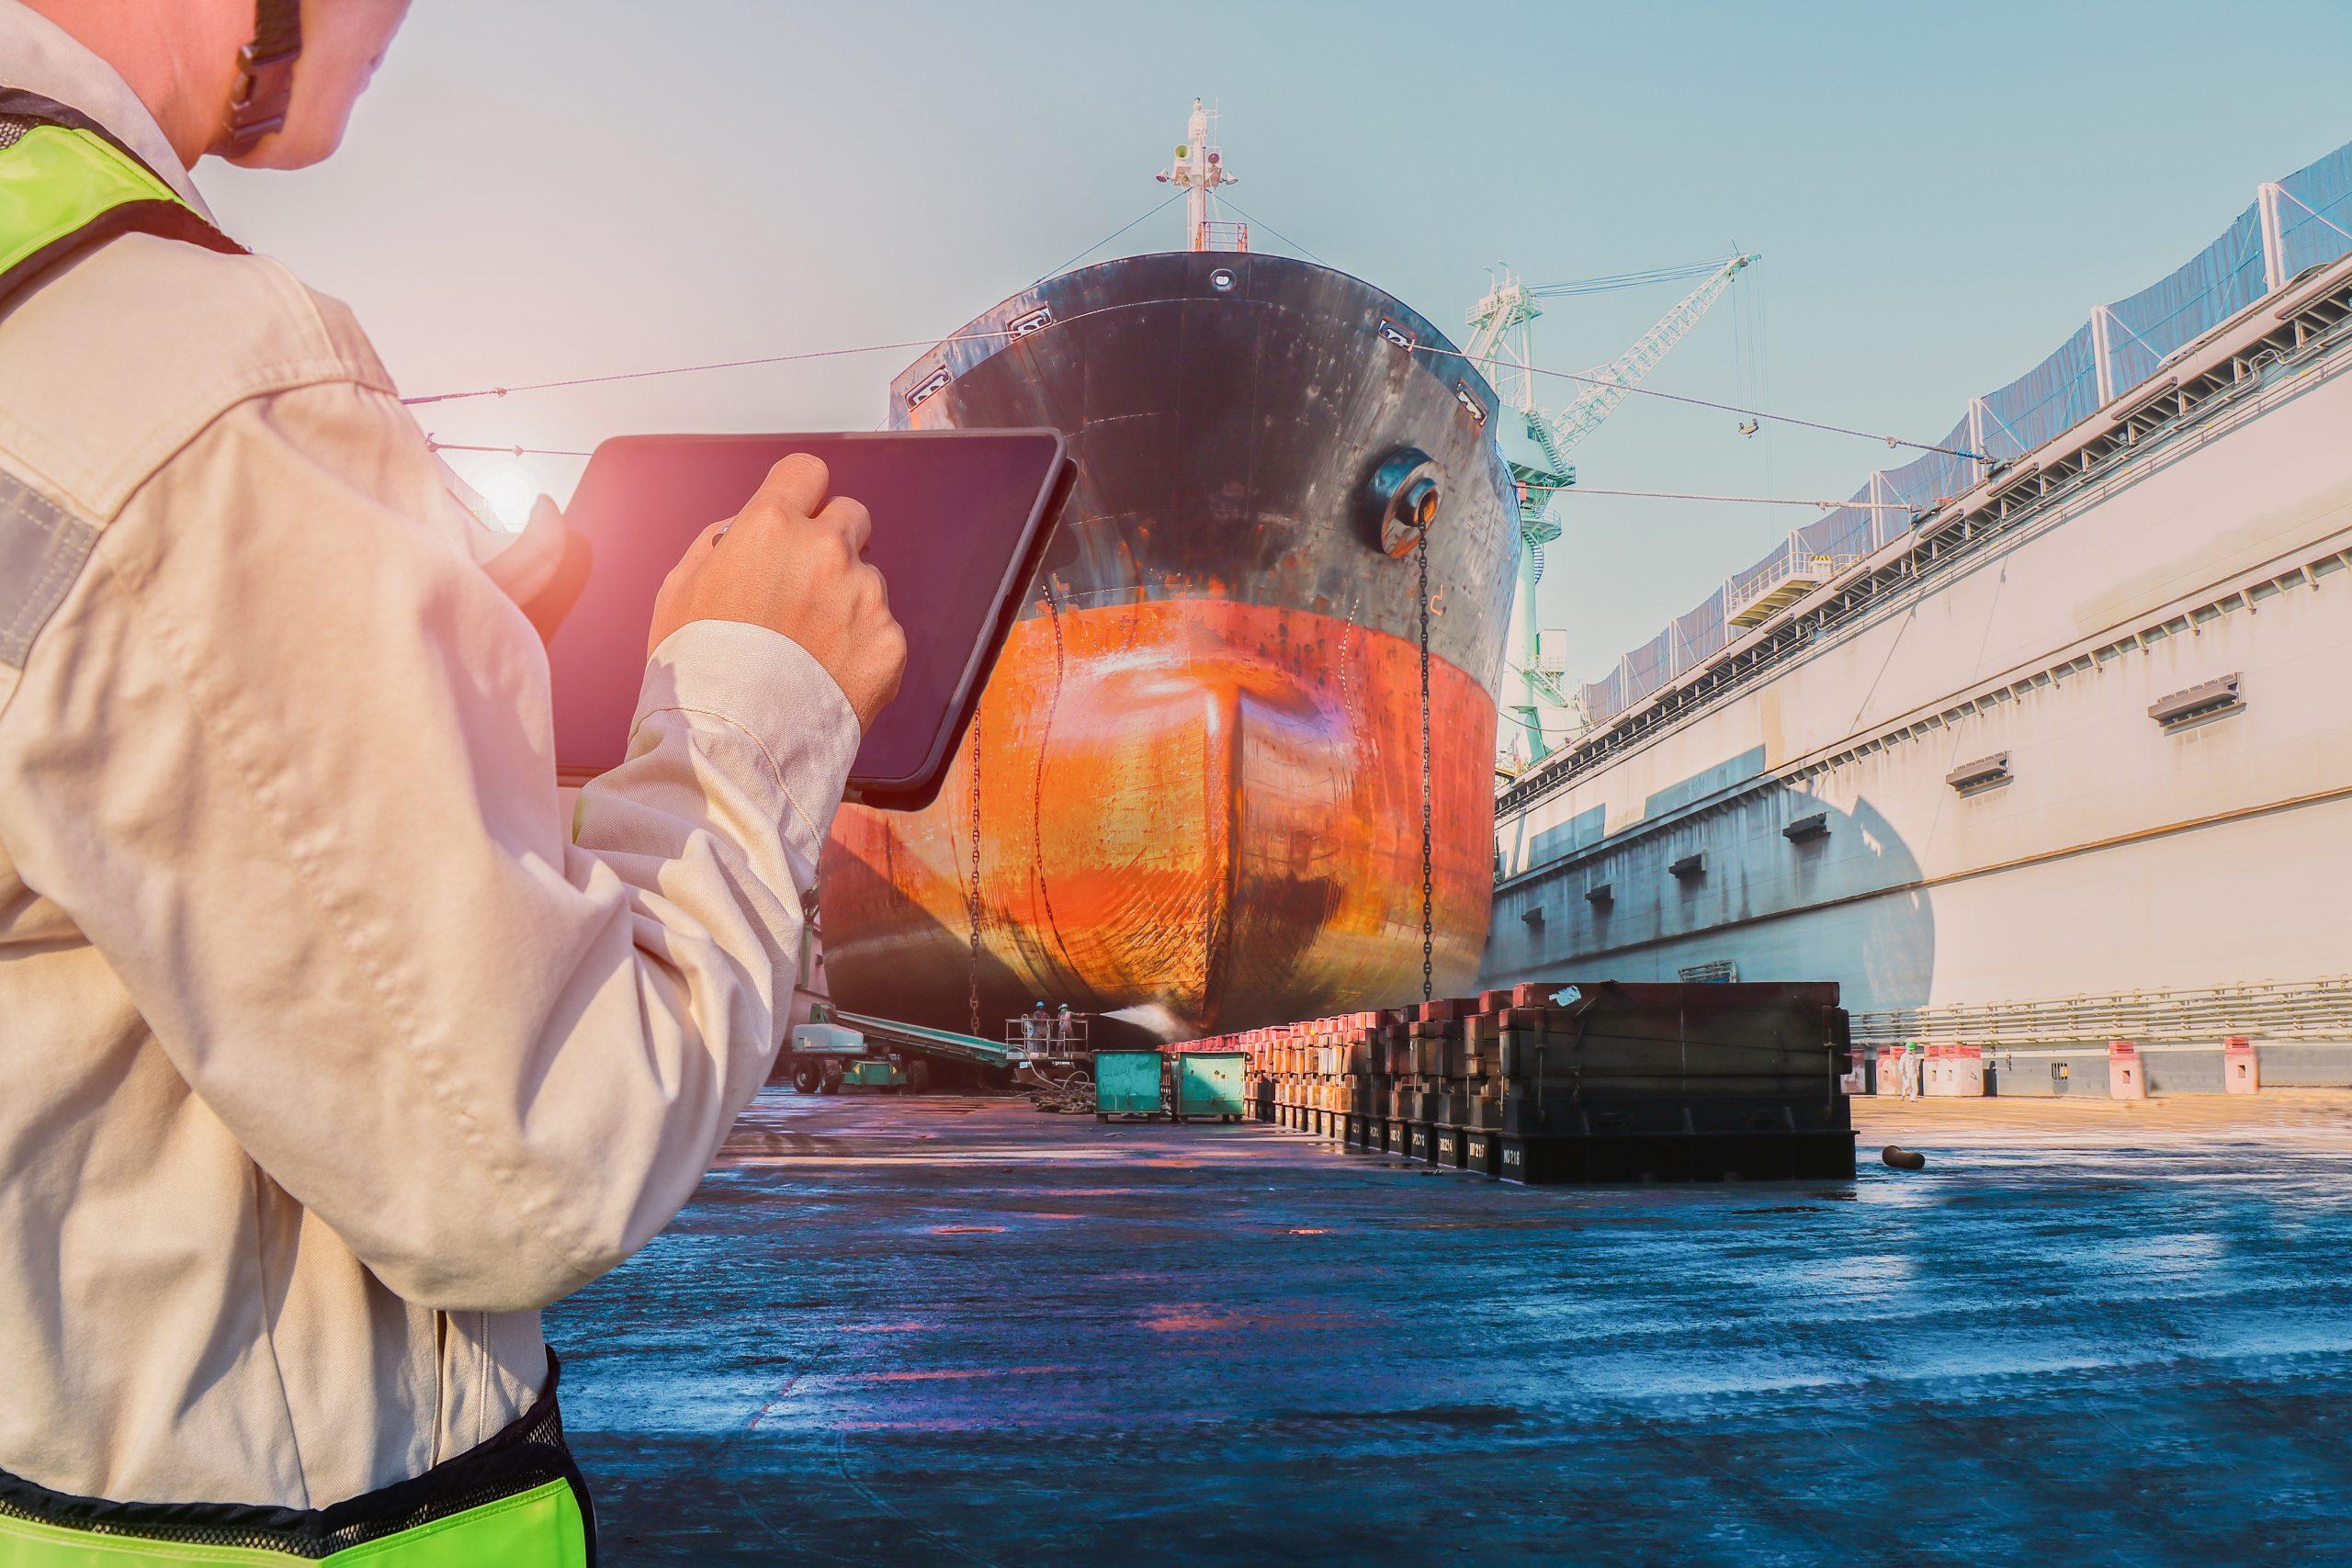 Surveyor inspecting ship in floating dock